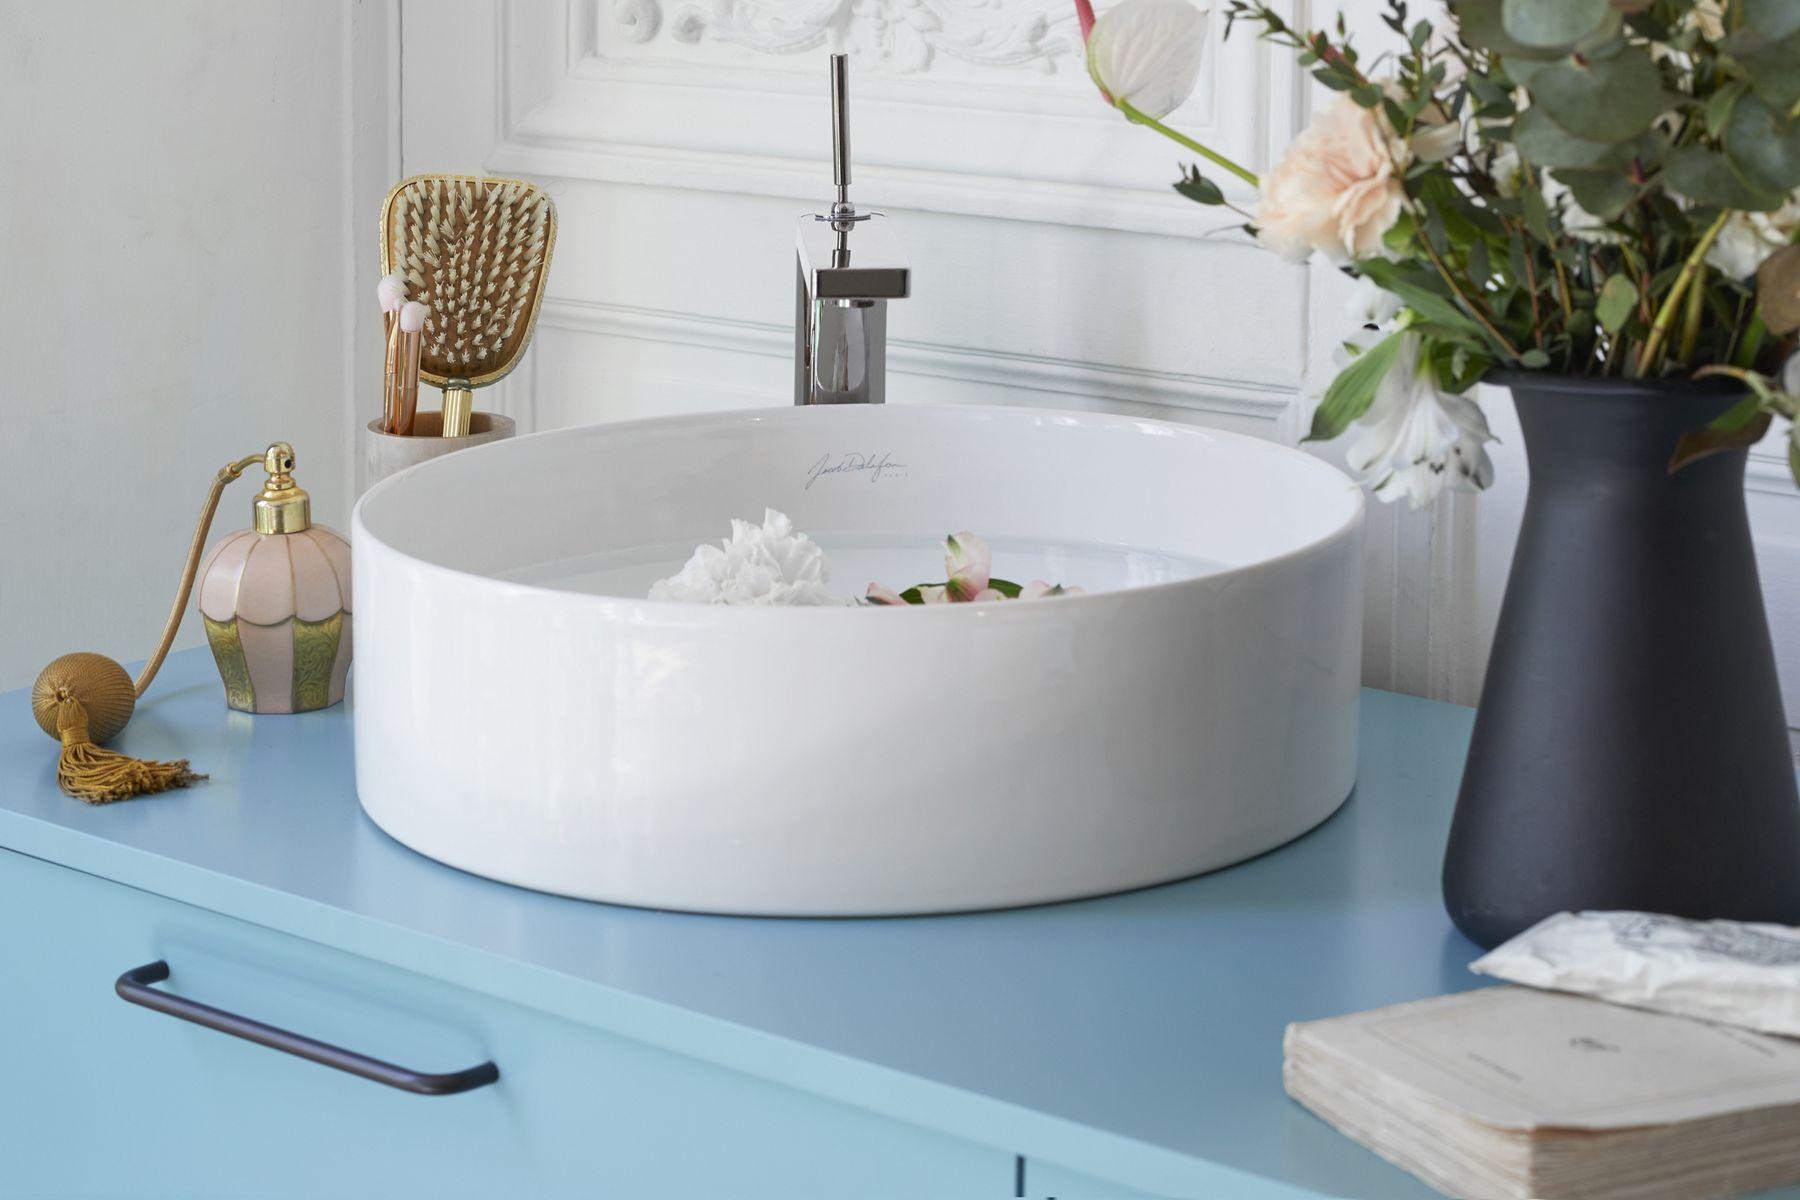 Comment choisir sa vasque, son plan vasque, ou son lavabo